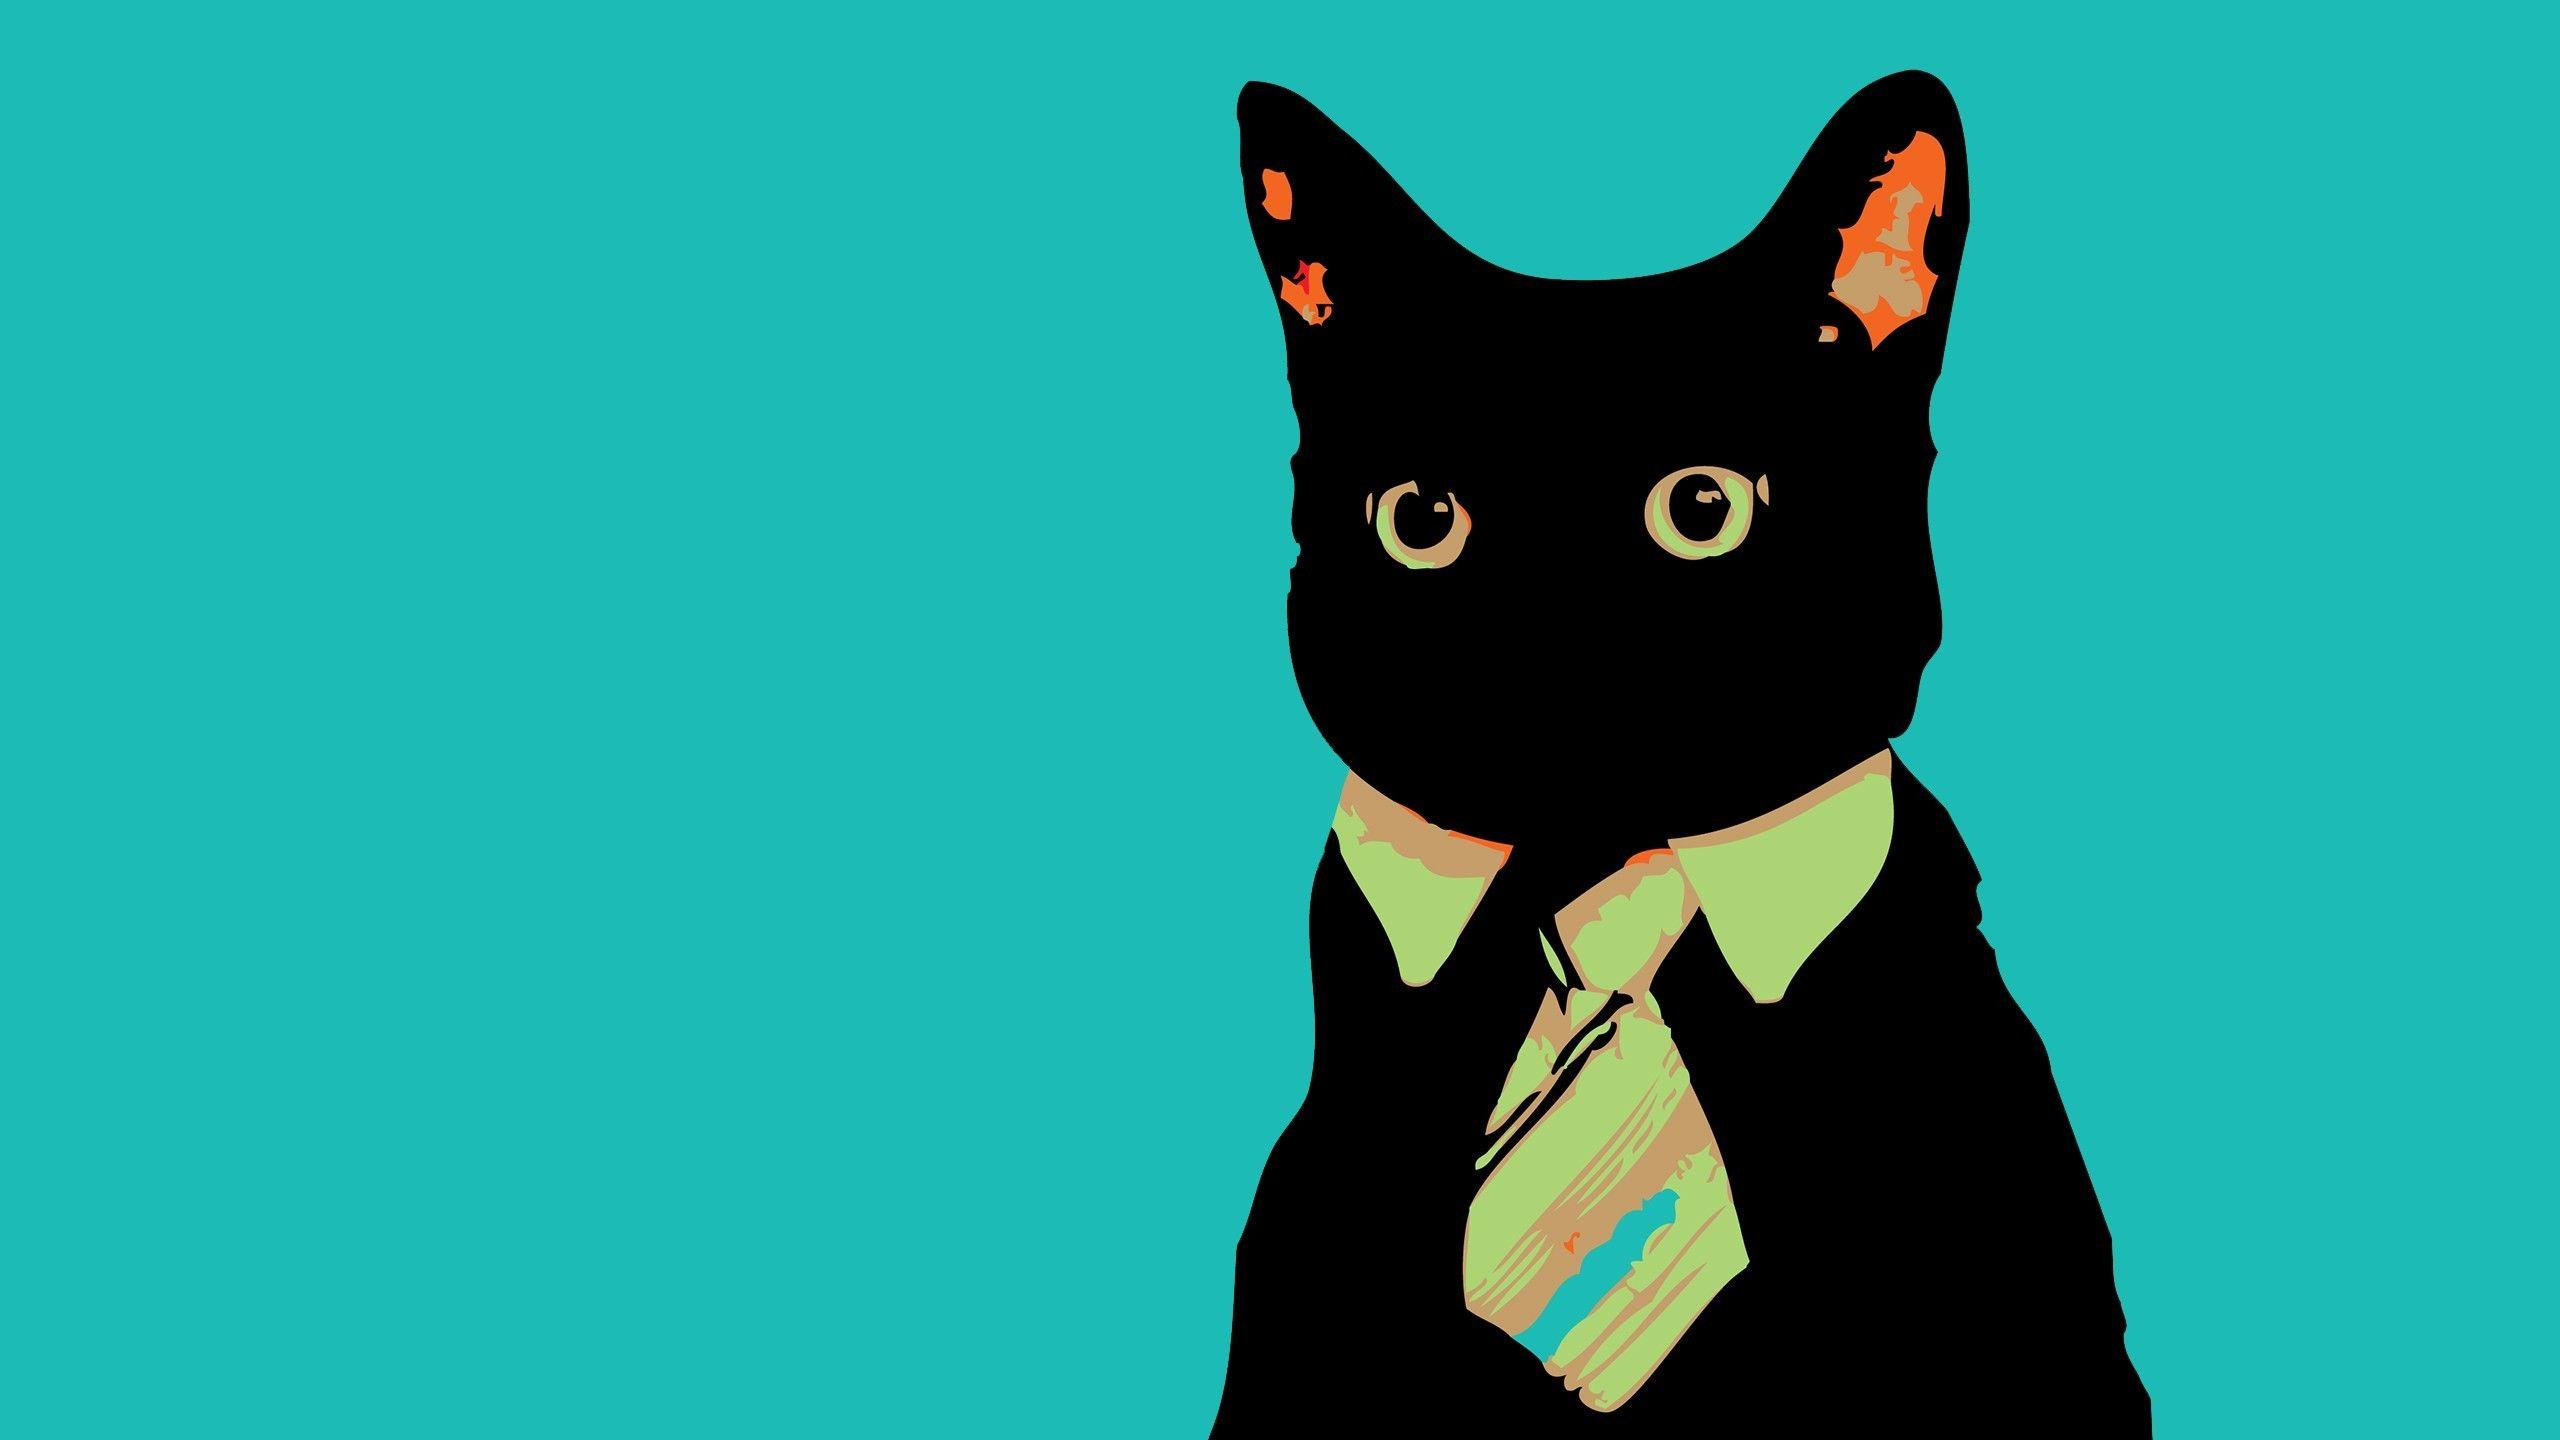 Minimalist Cat Desktop Wallpapers - Wallpaper Cave